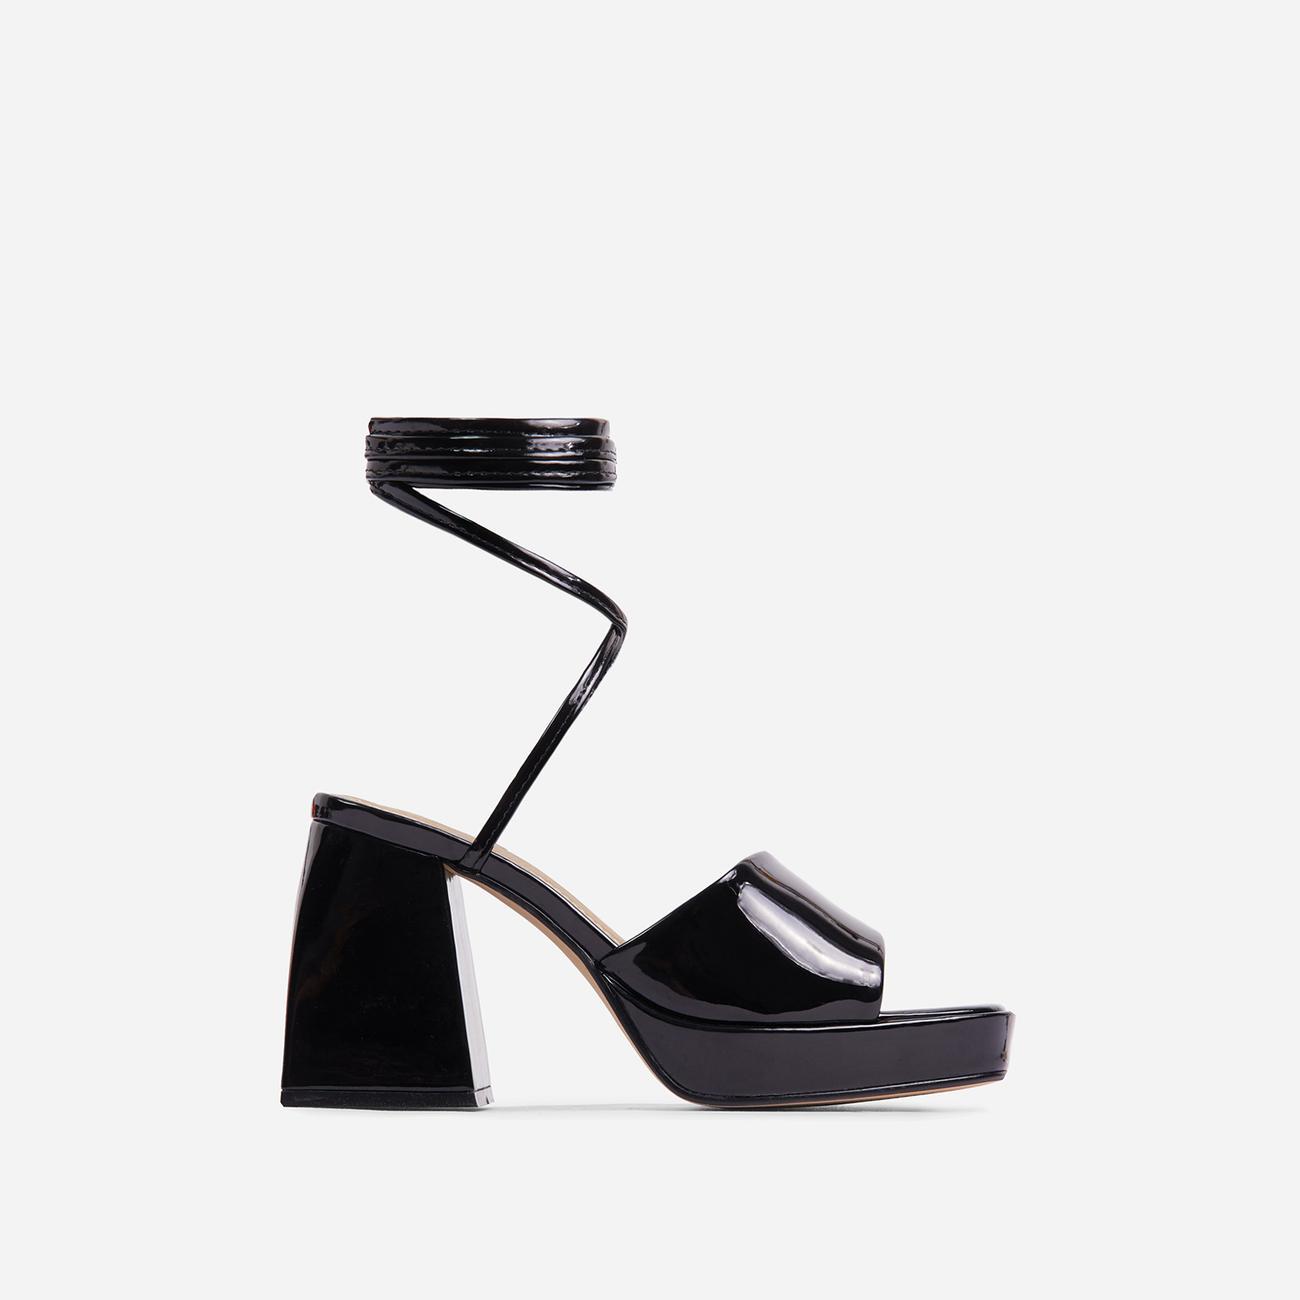 Dreamer Lace Up Square Toe Platform Flared Block Heel In Black Patent Image 1